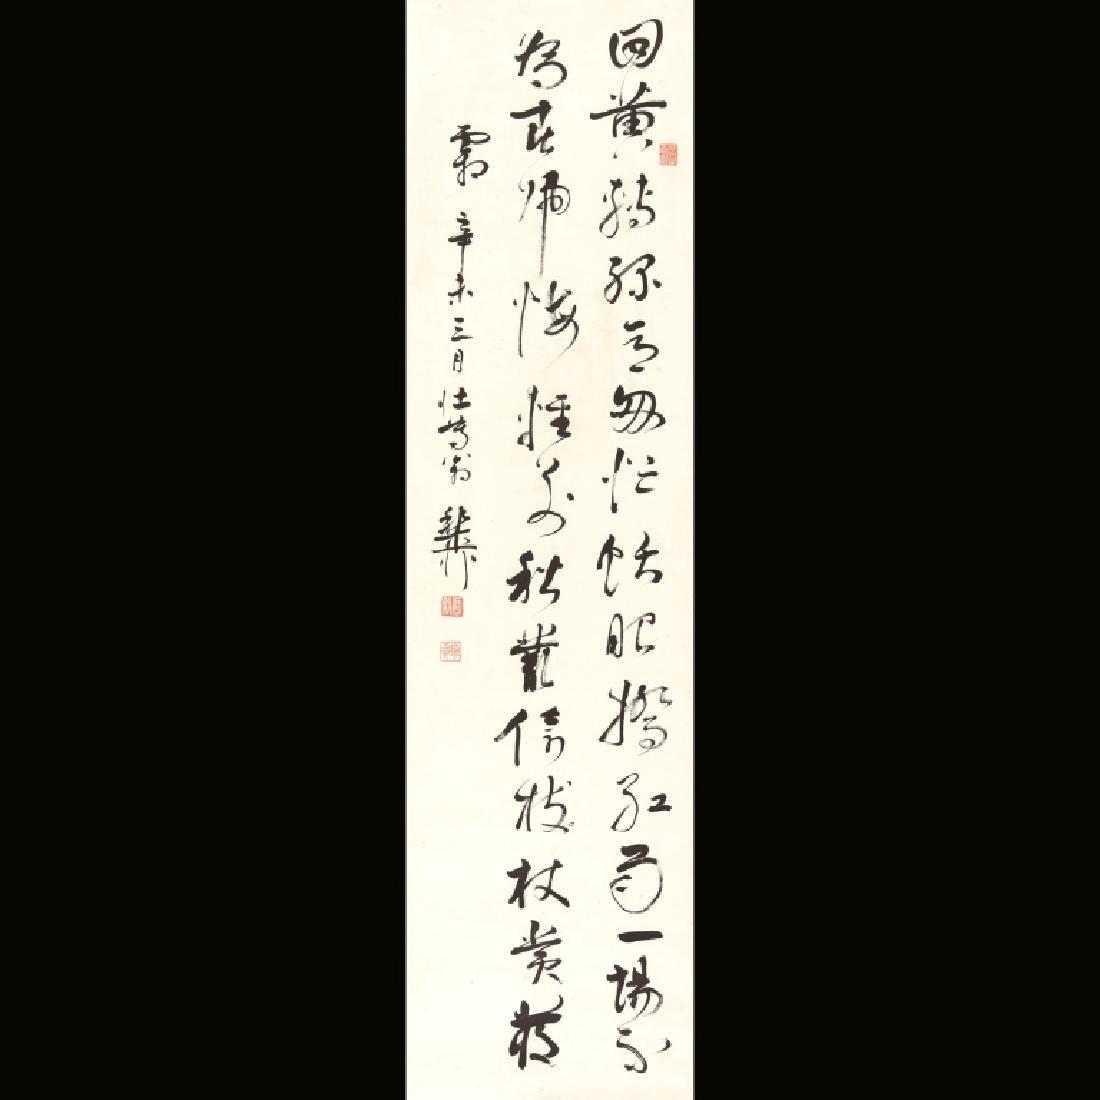 XIE ZHILIU (1910-1997) CHINESE CALLIGRAPHY